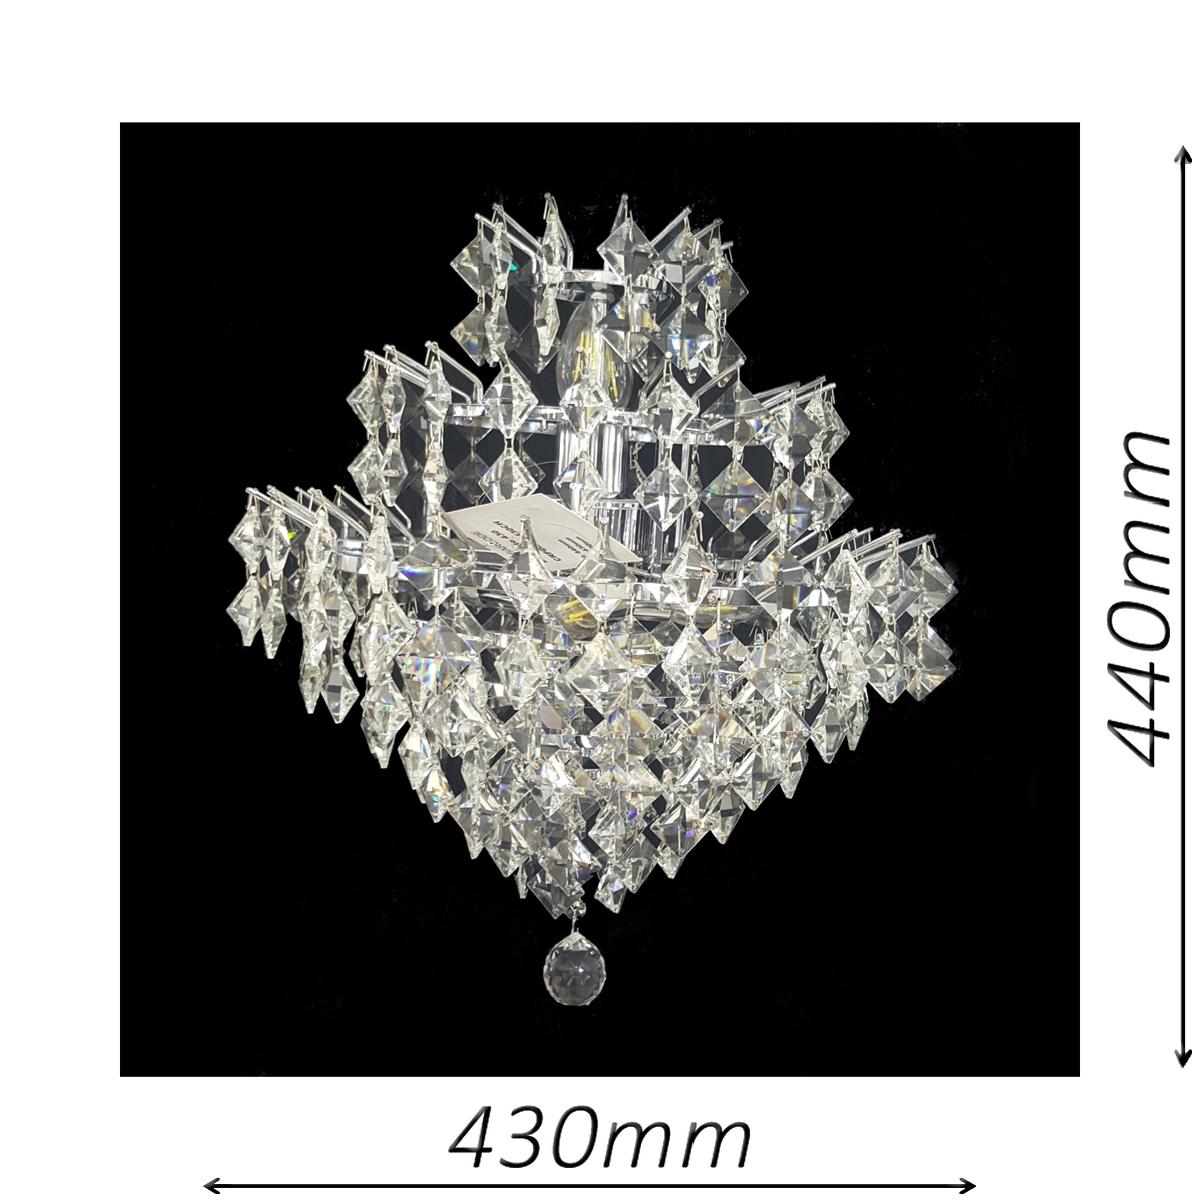 Diamante 430 Chrome Chandelier - CRPDIA05430CH